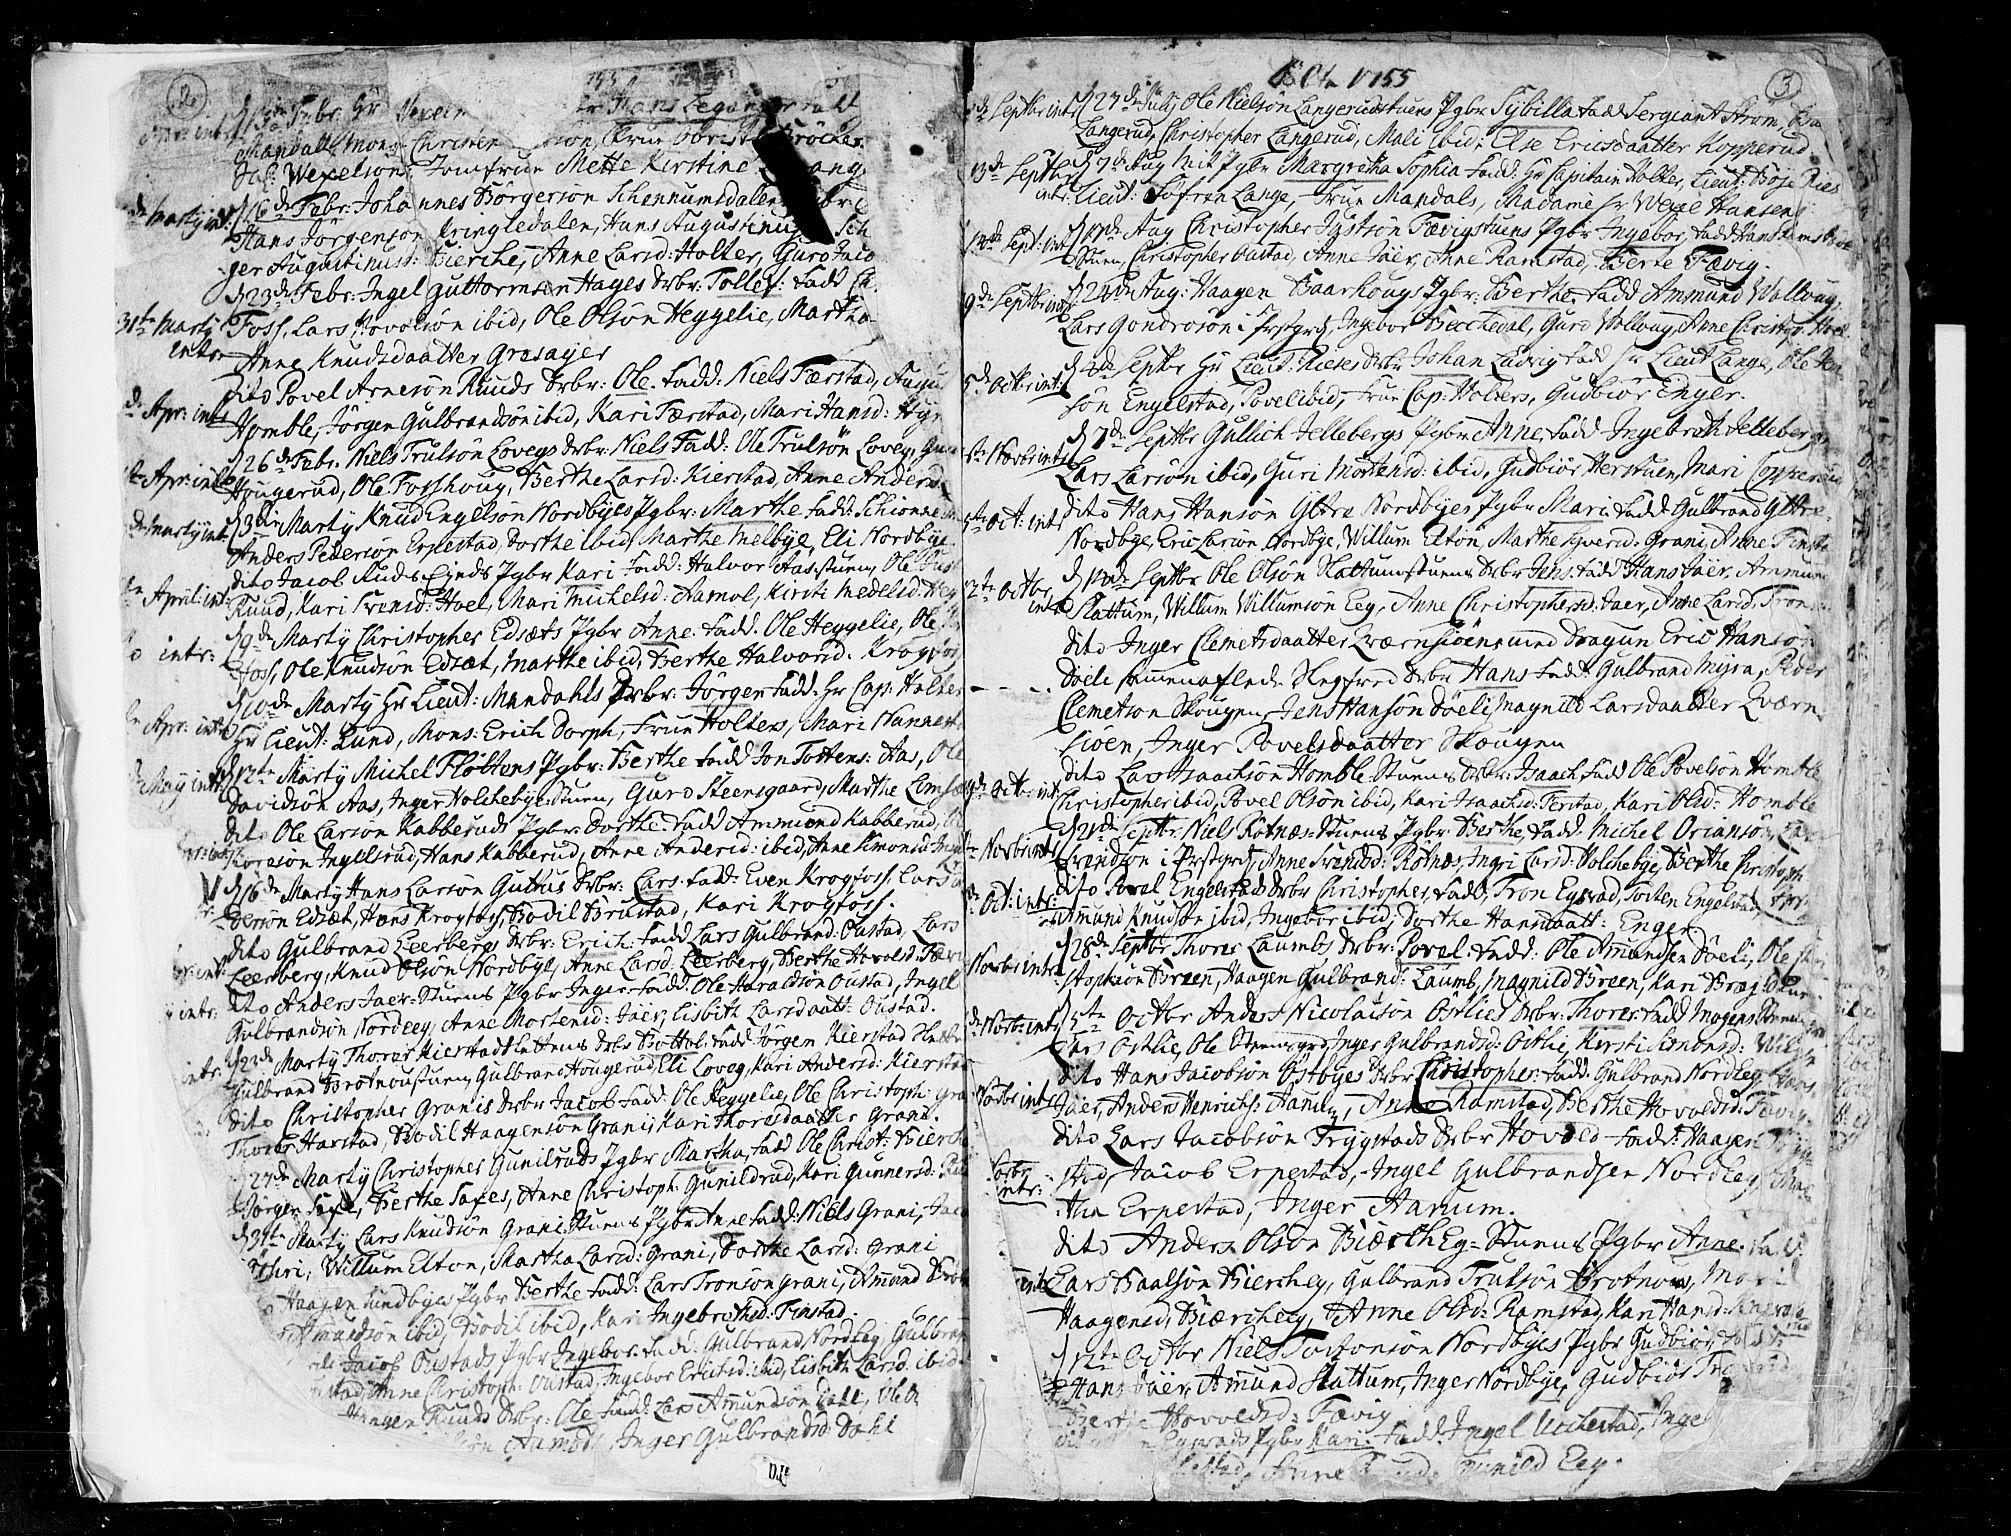 SAO, Nannestad prestekontor Kirkebøker, F/Fa/L0007: Ministerialbok nr. I 7, 1754-1791, s. 2-3